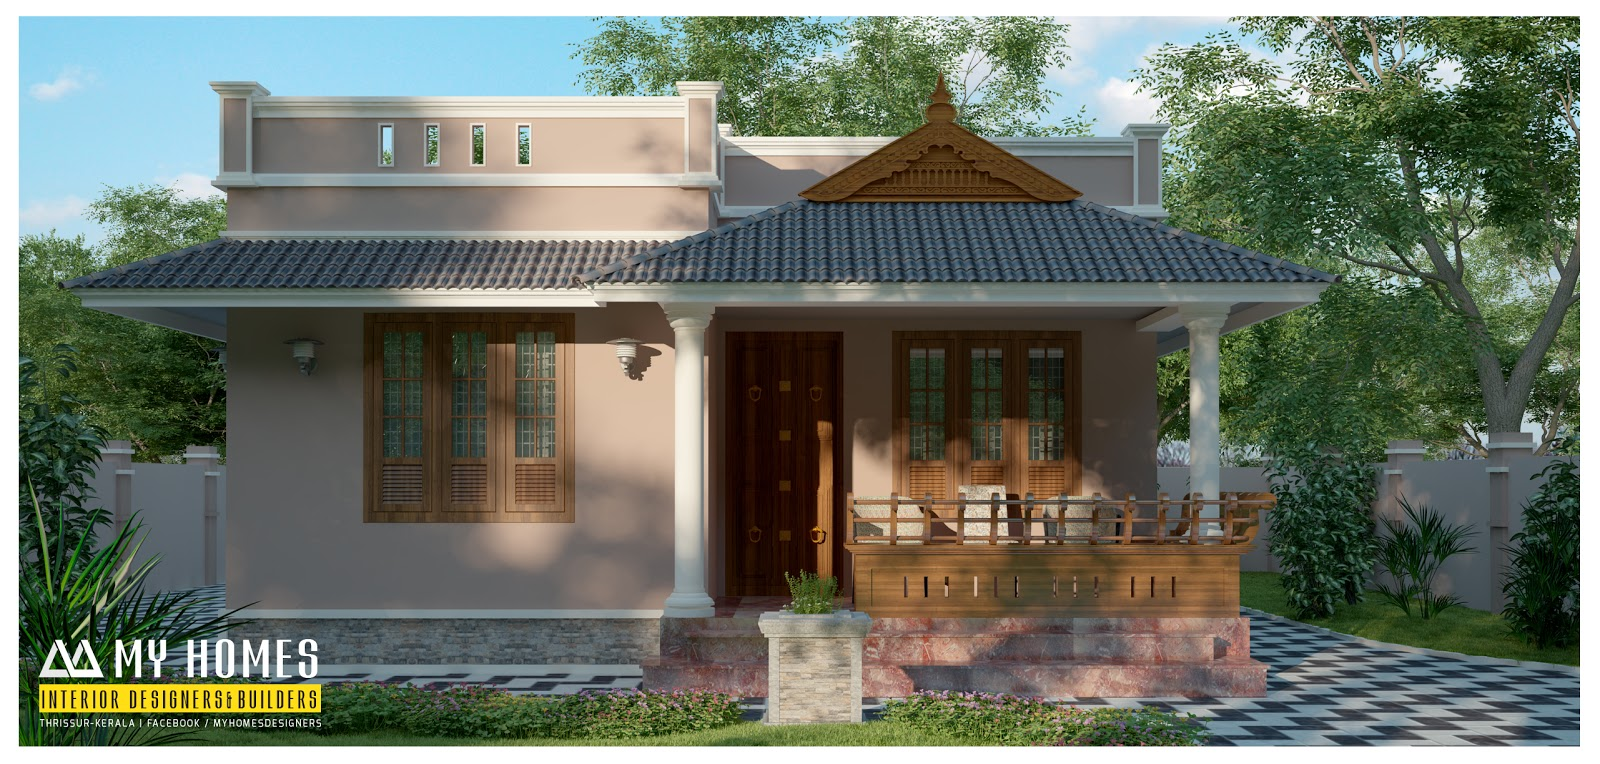 VEEDU DESIGNS 900 Sqft Kerala Home Design